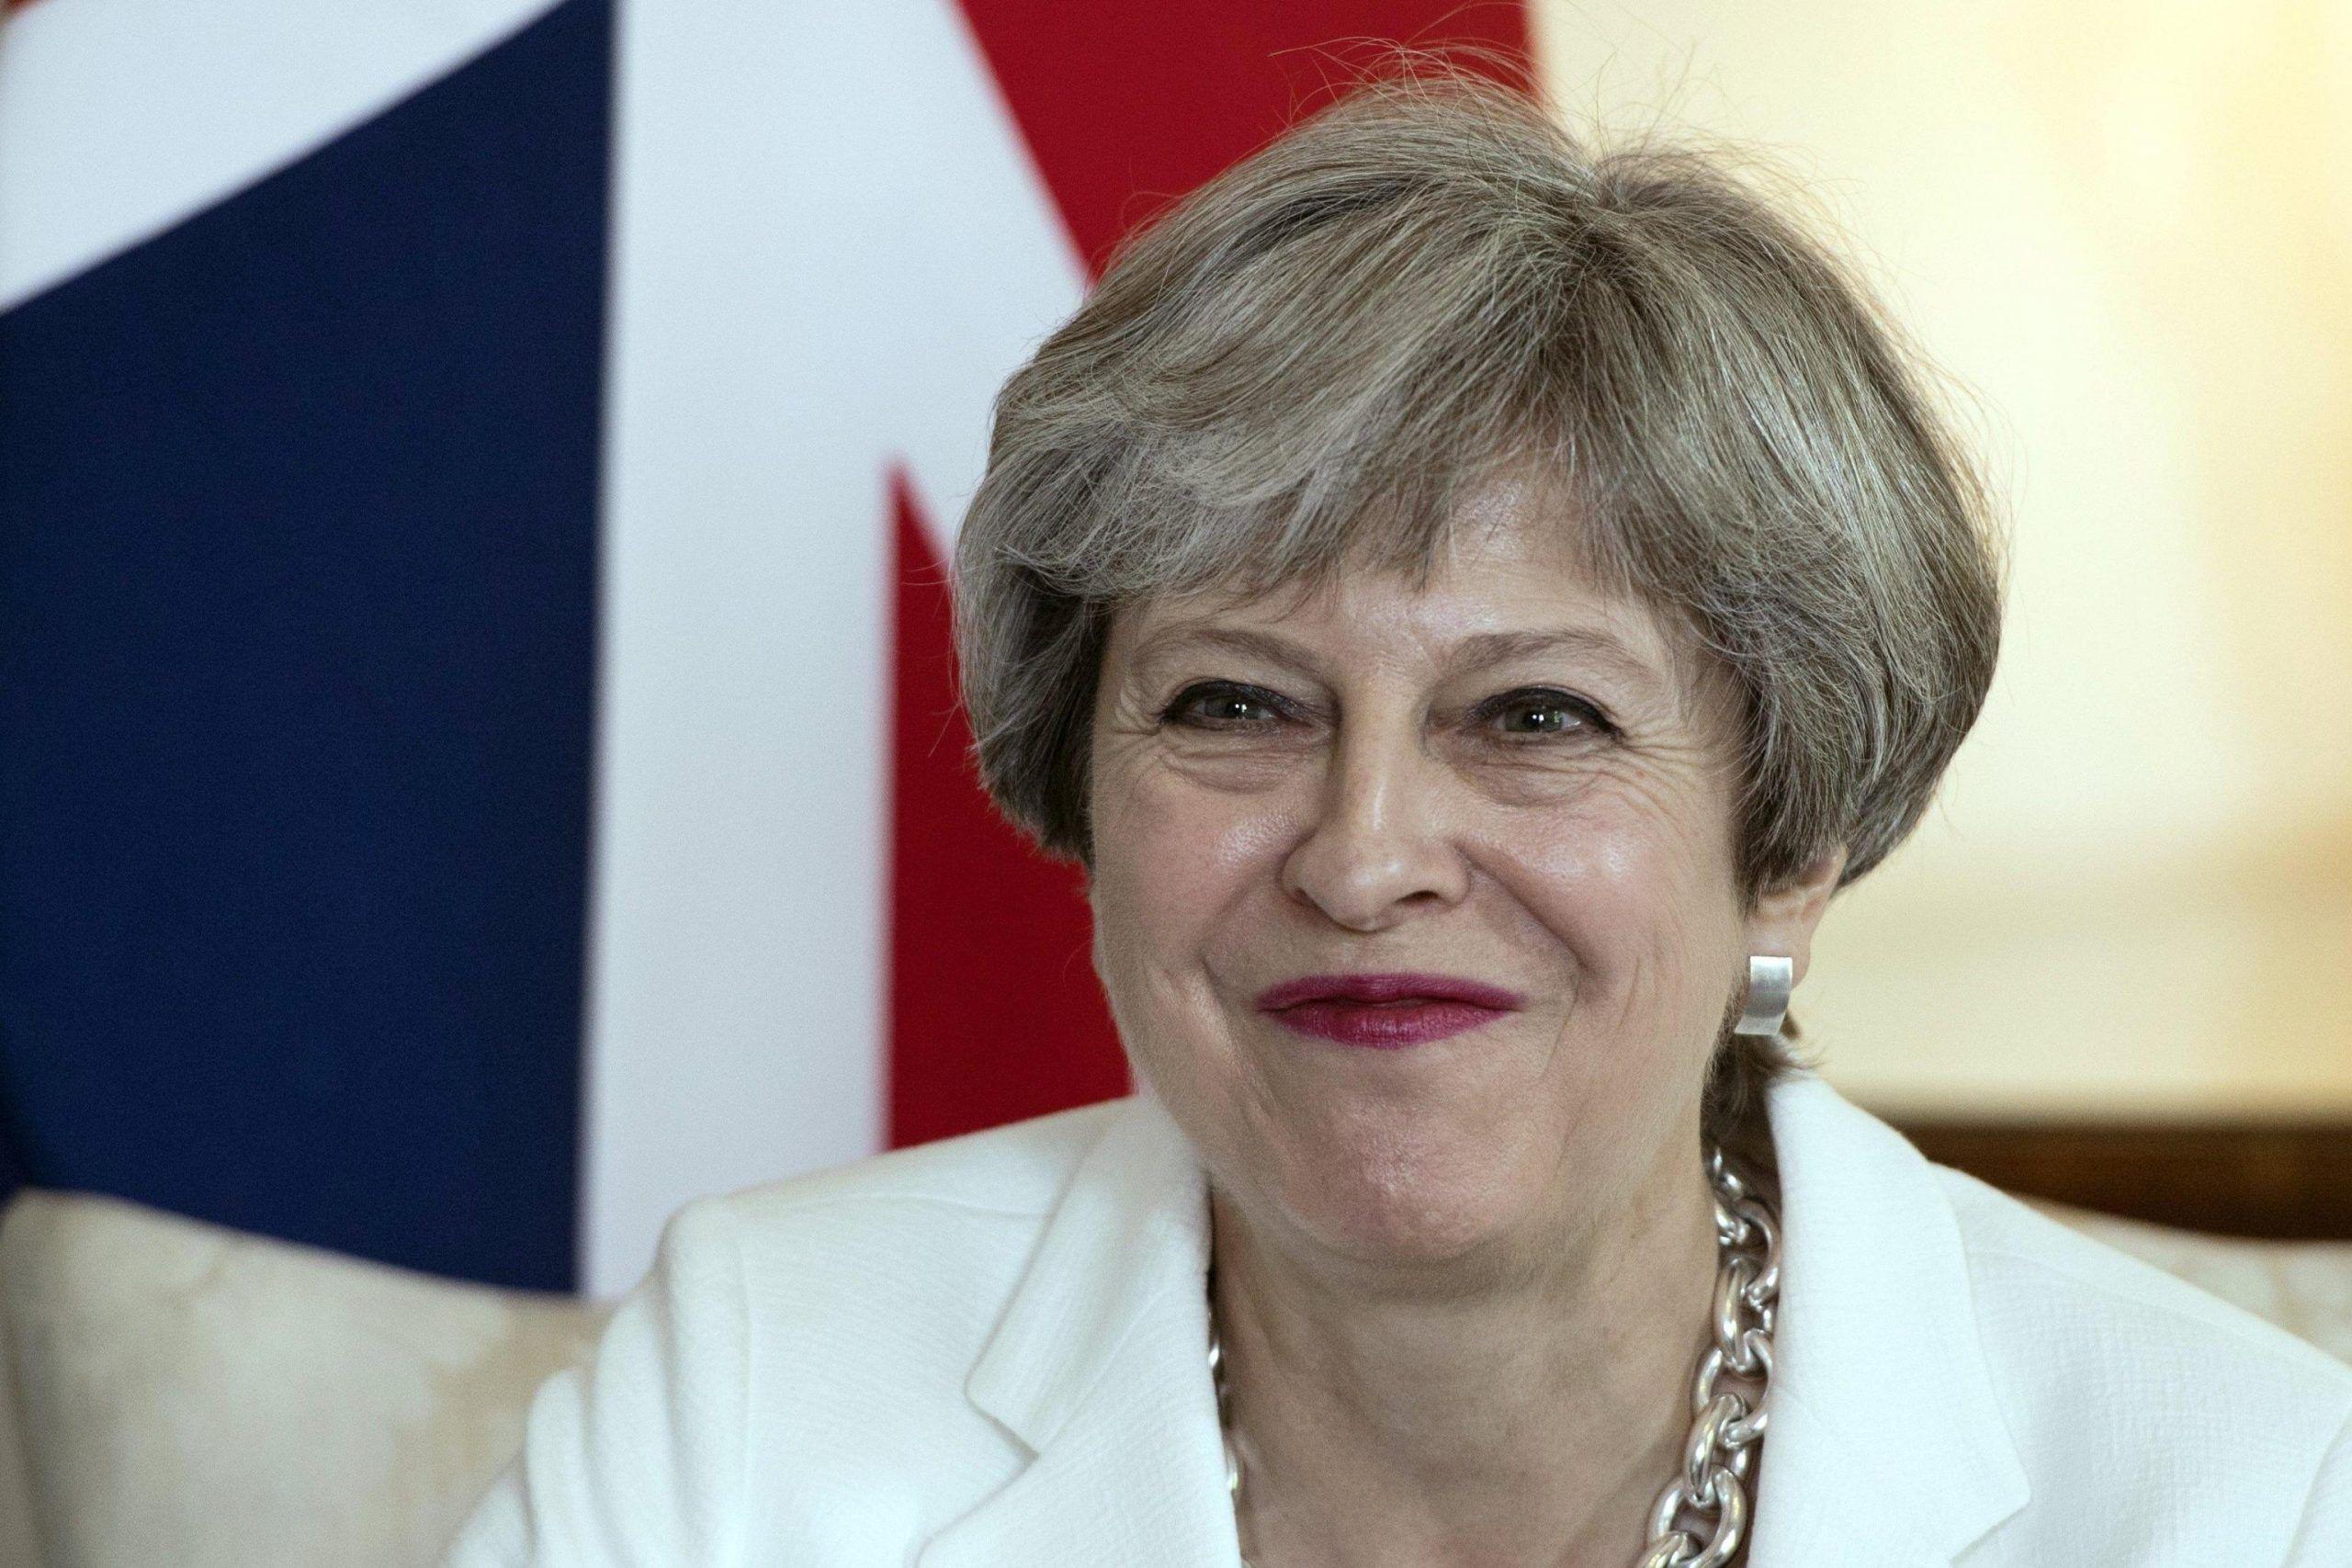 British Prime Minister Theresa May mets with Estonian Prime Minister Juri Ratas